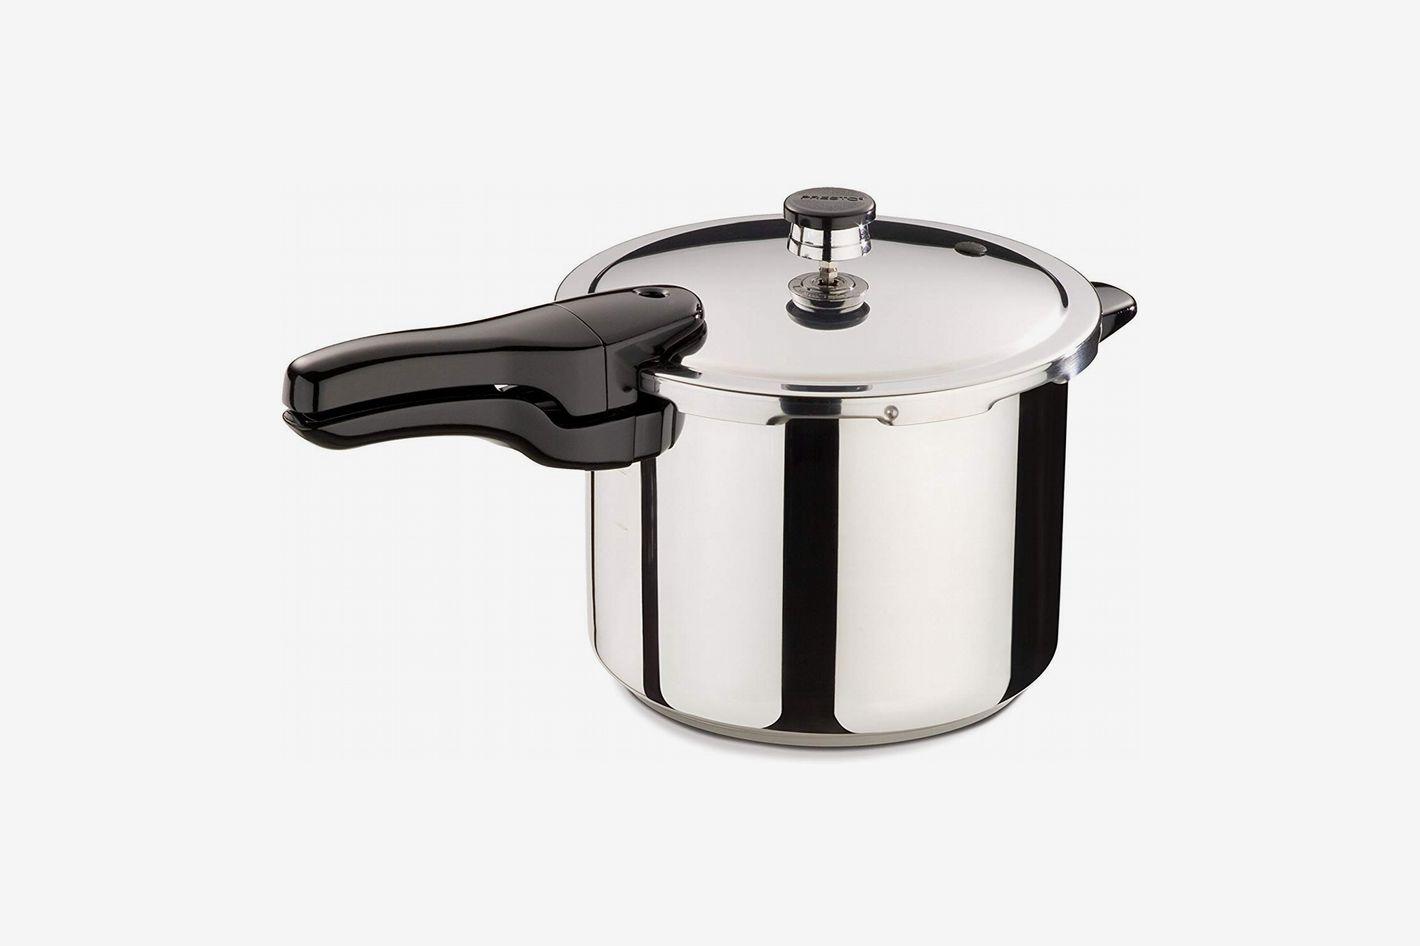 Presto 6-Quart Stainless Steel Pressure Cooker